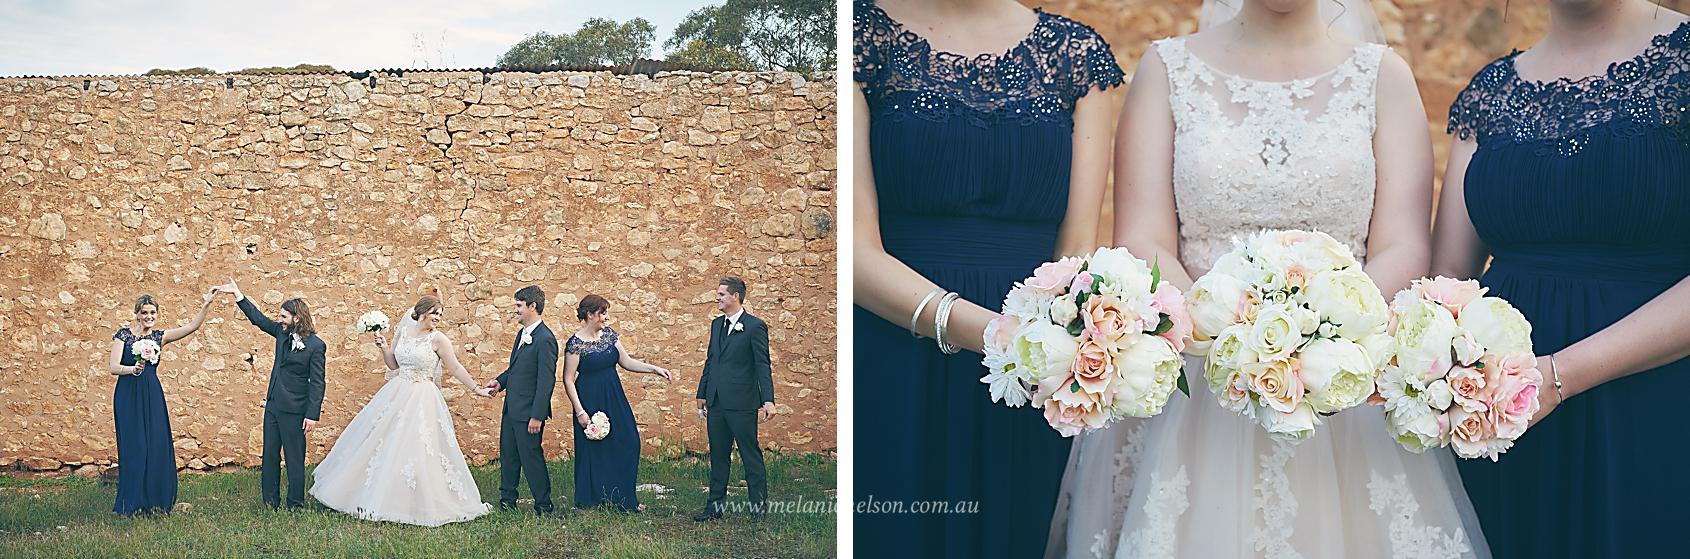 yorke_peninsula_wedding_photographer_0093.jpg